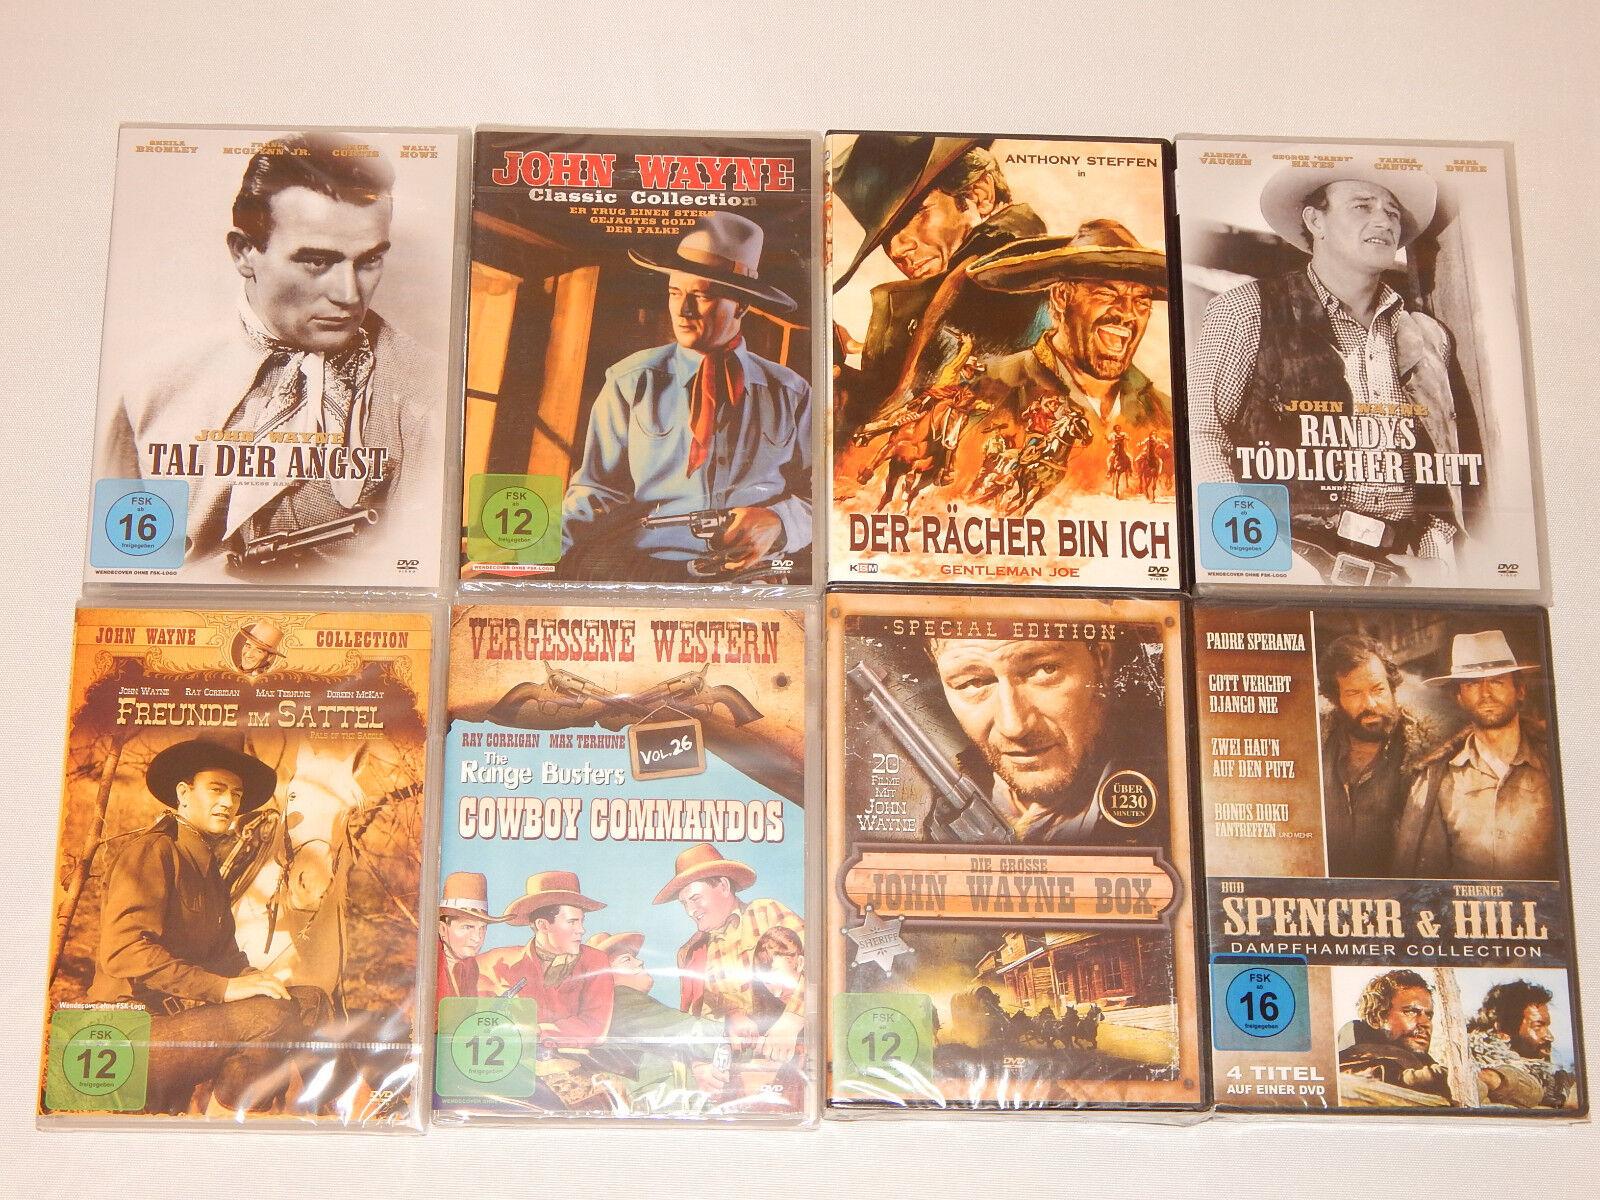 30 FILME WESTERN JOHN WAYNE BUD SPENCER KLASSIKER DVD BOX COLLECTION SAMMLUNG !